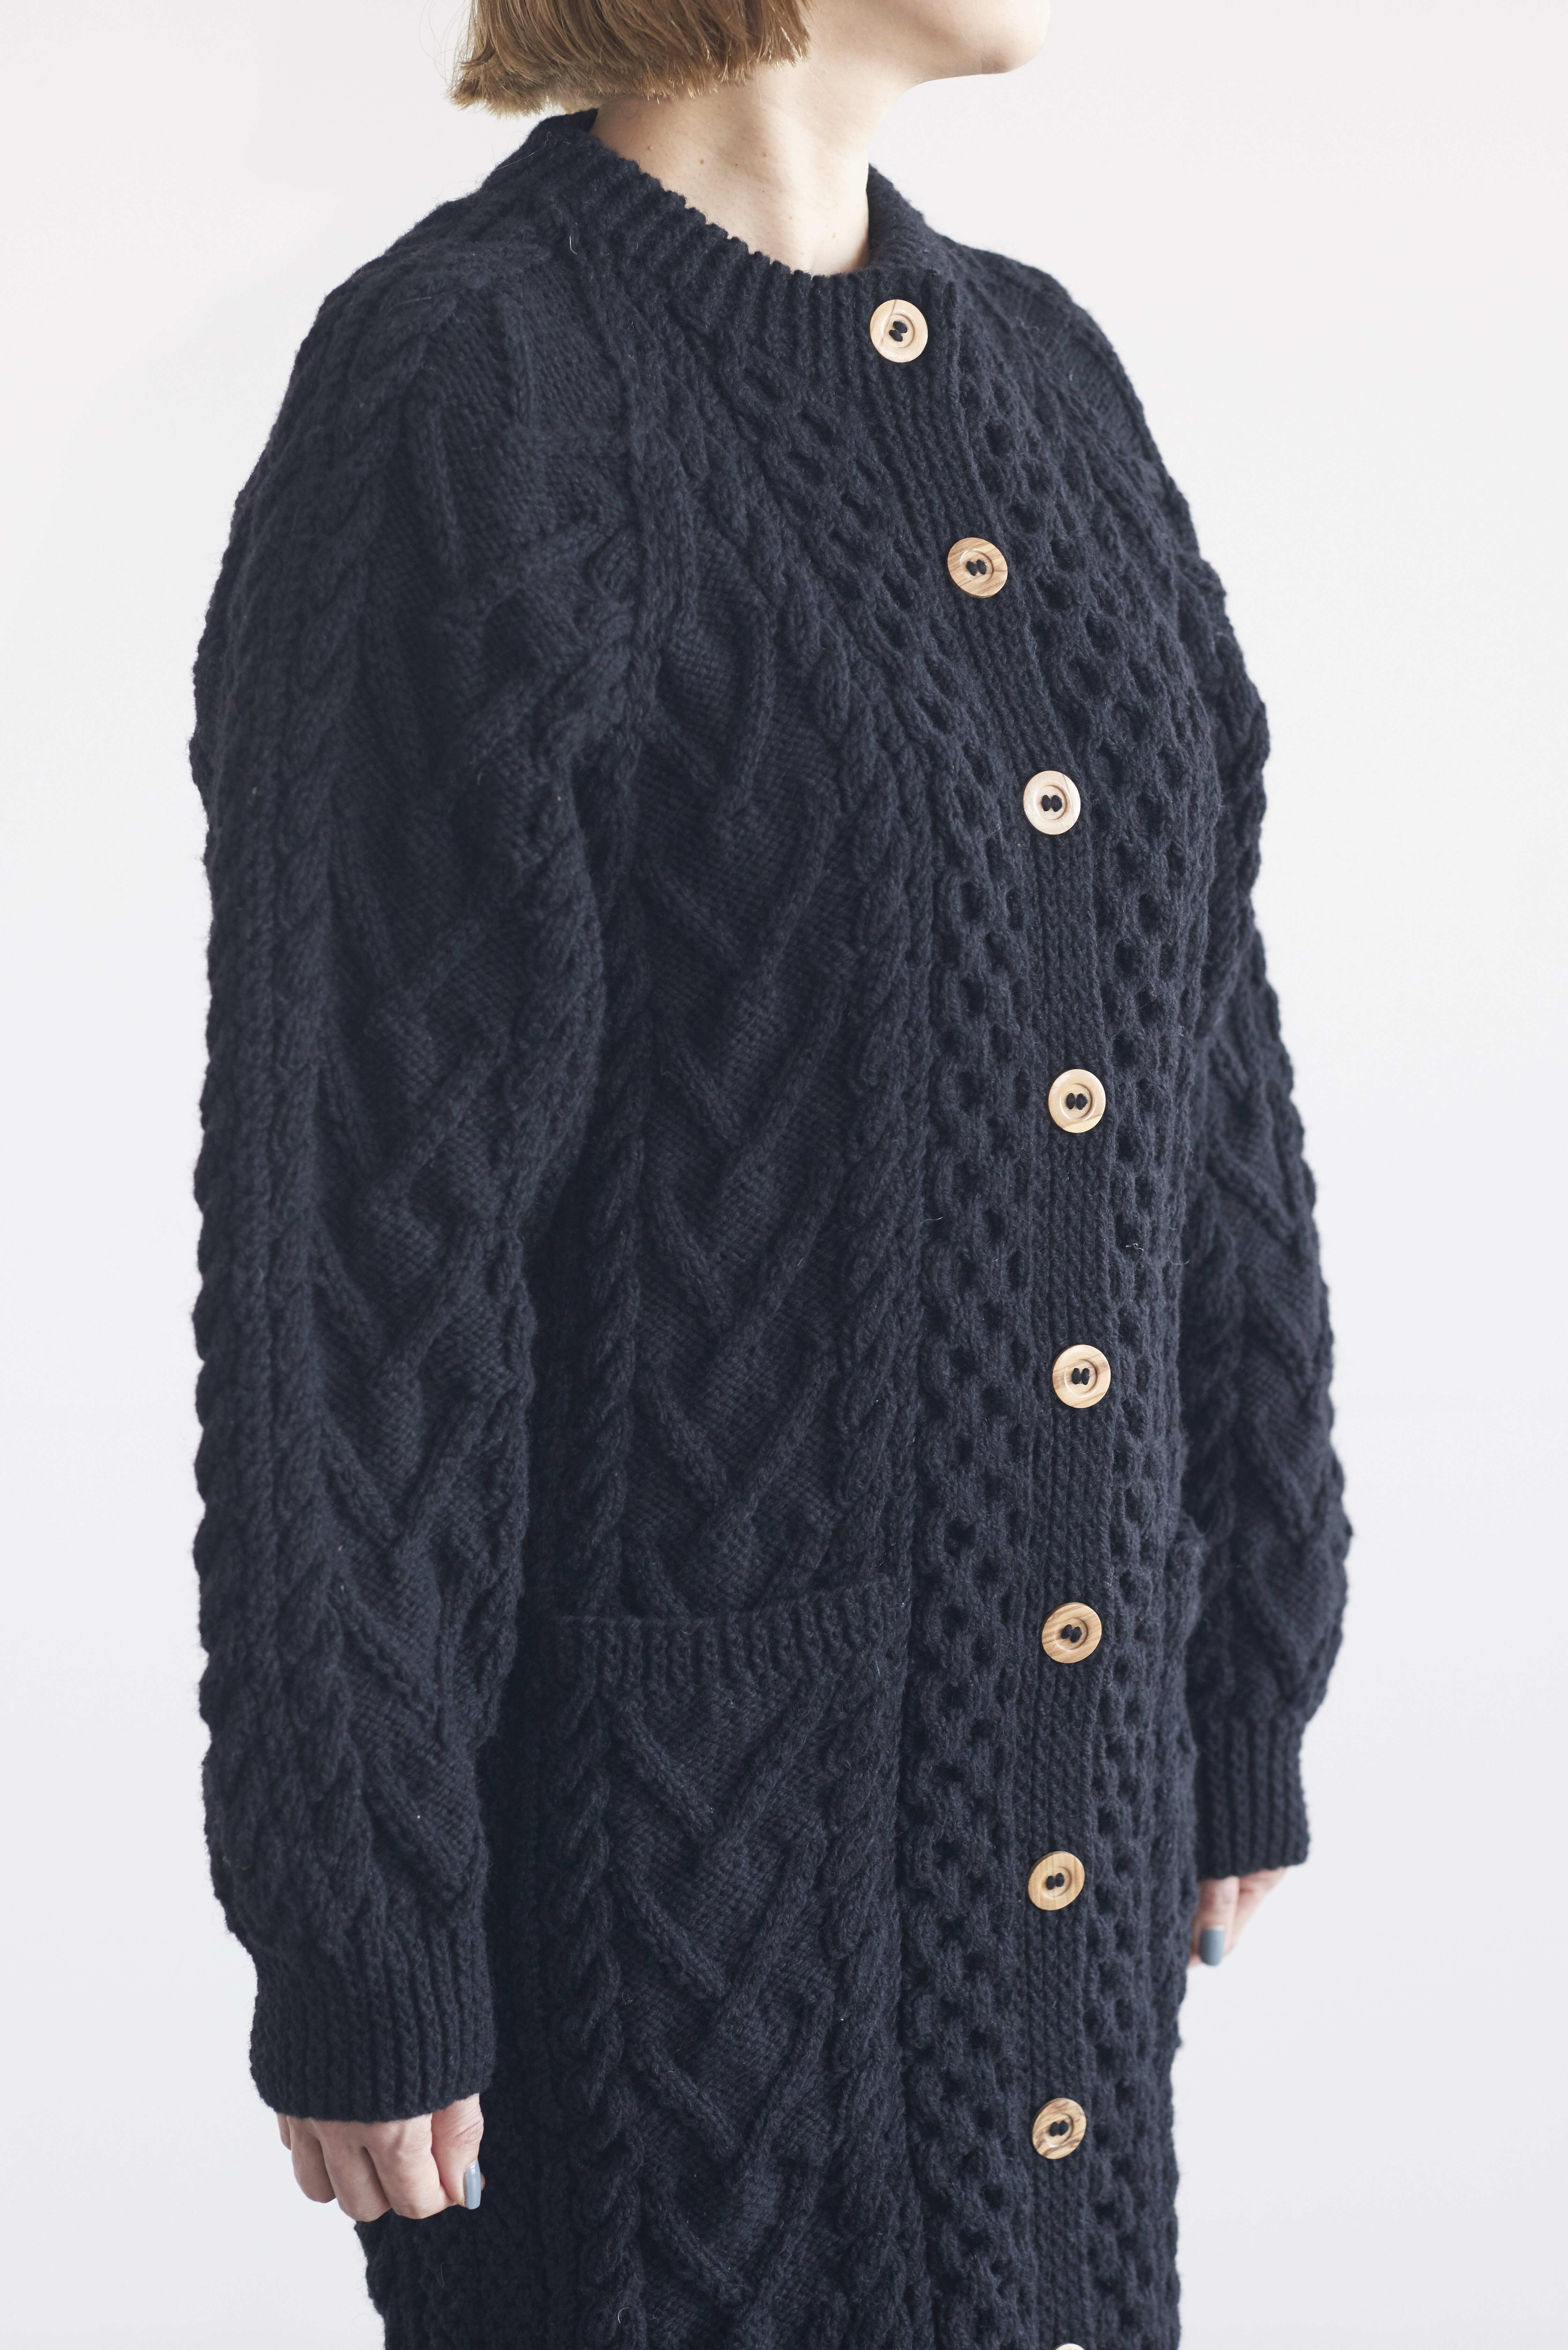 Athena Designs long aran coat